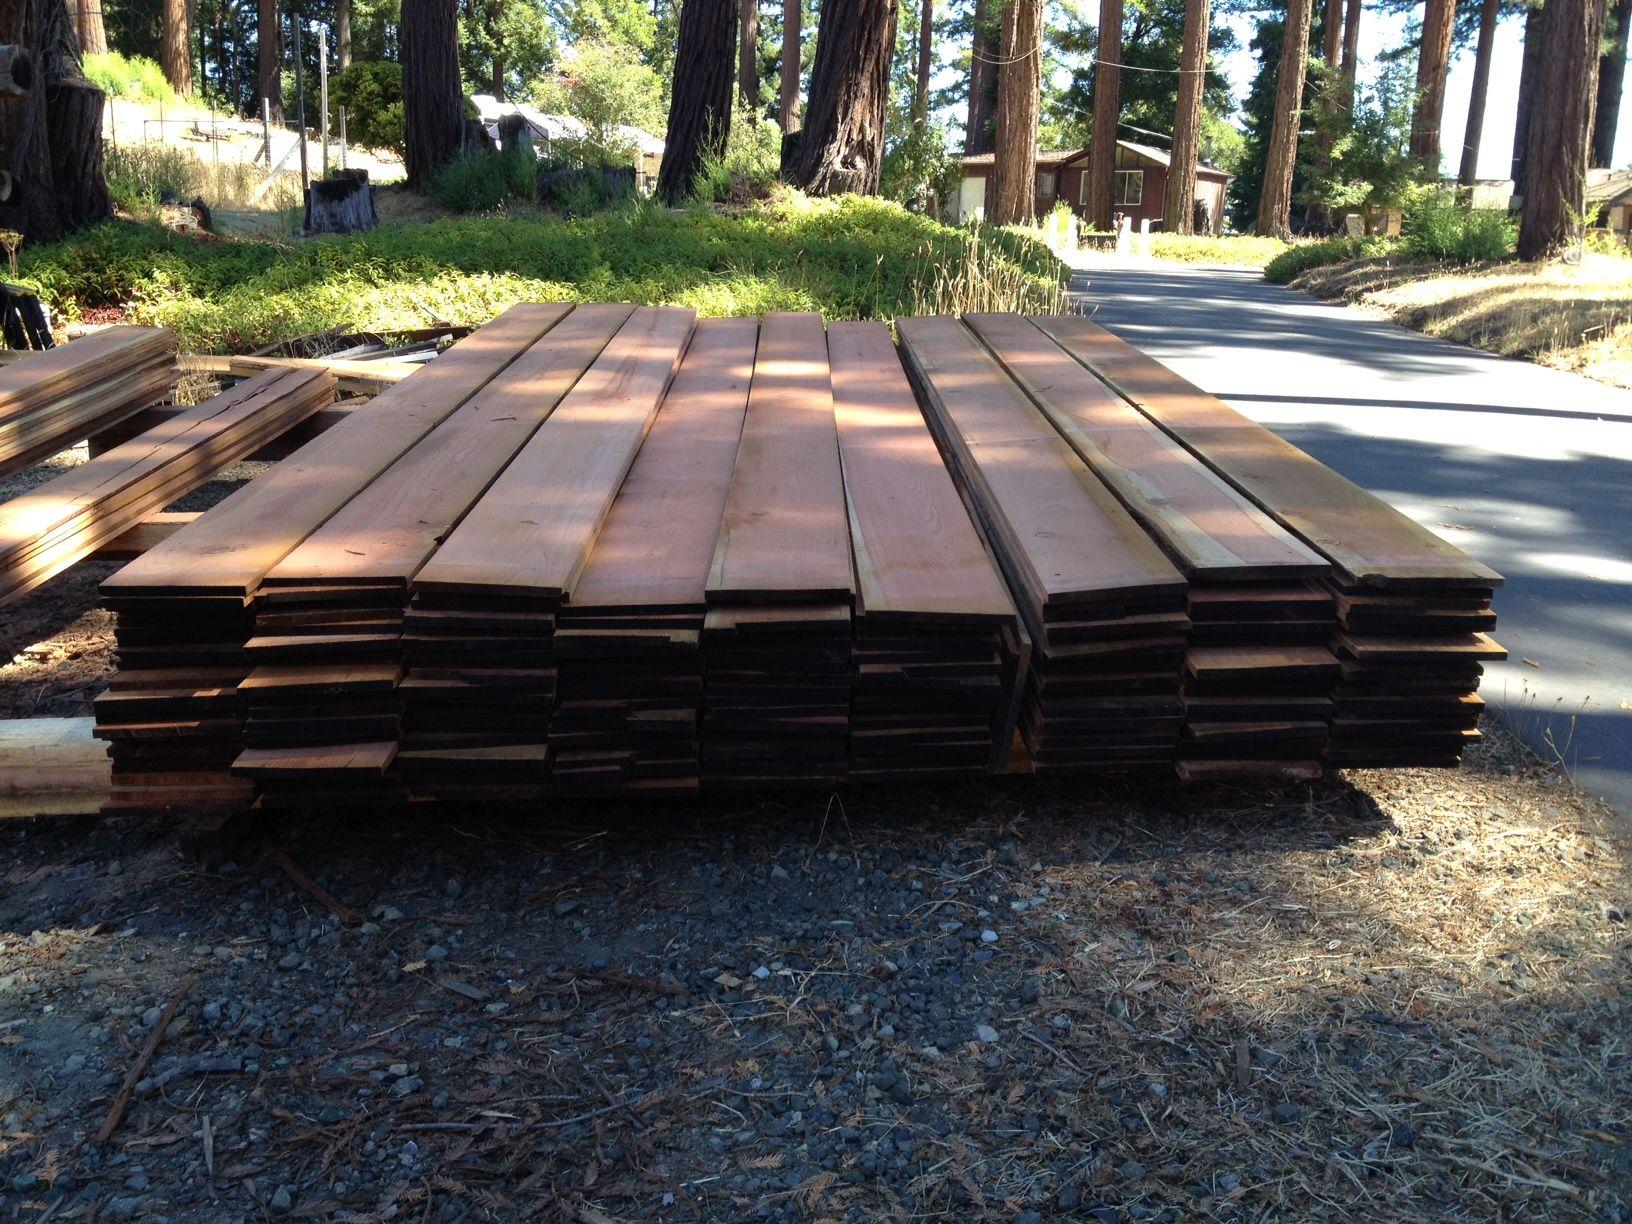 Air Dried 1x12 Rough Sawn Redwood For Sale All Grades Santacruzsawmill Com In Santa Cruz County California Redwood Lumber Redwood Slabs Rough Sawn Lumber